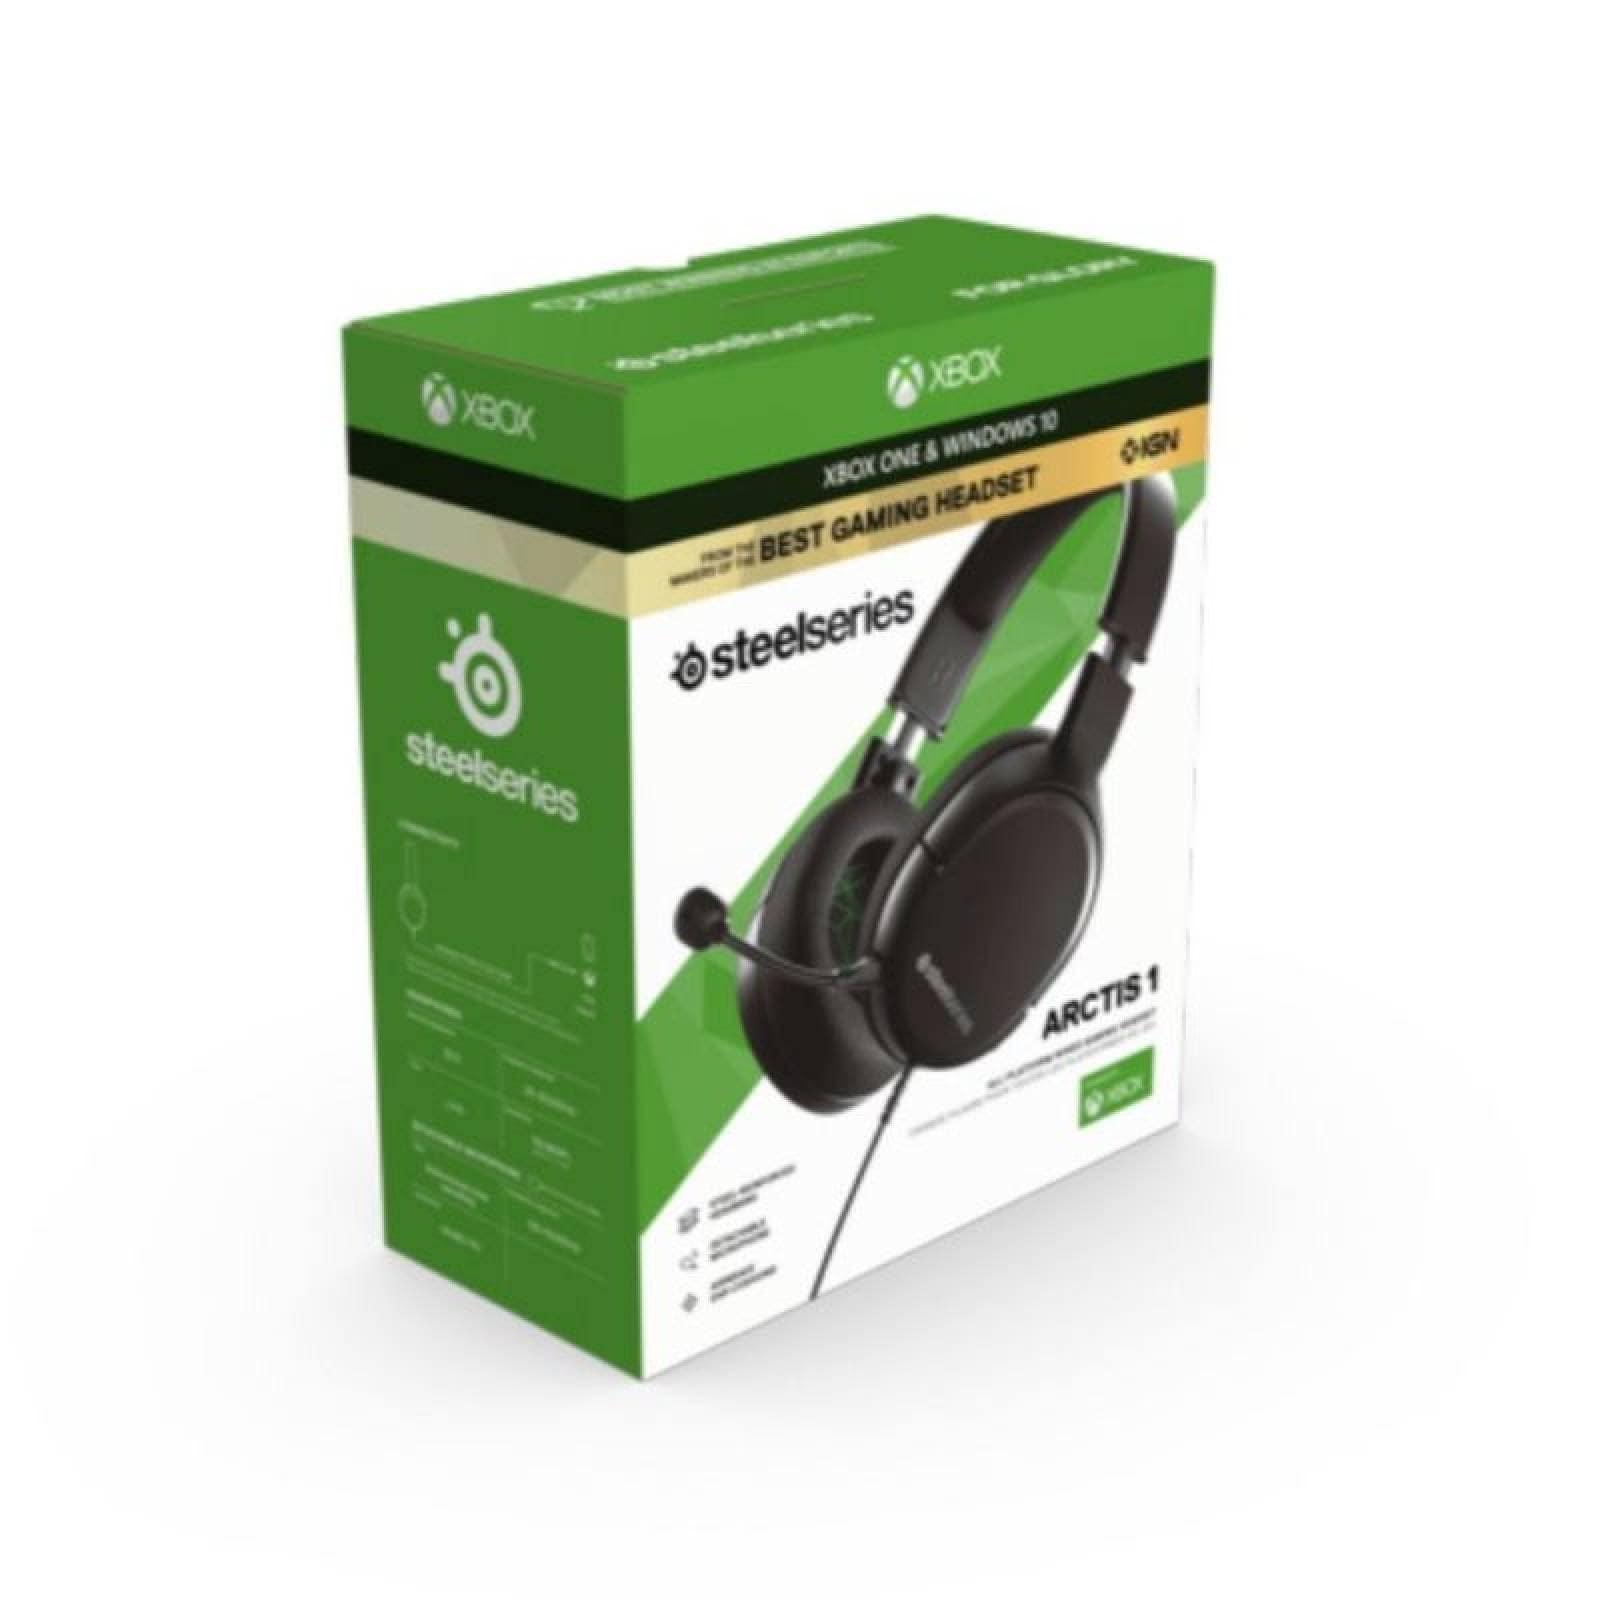 Audífonos Arctis 1 Xbox